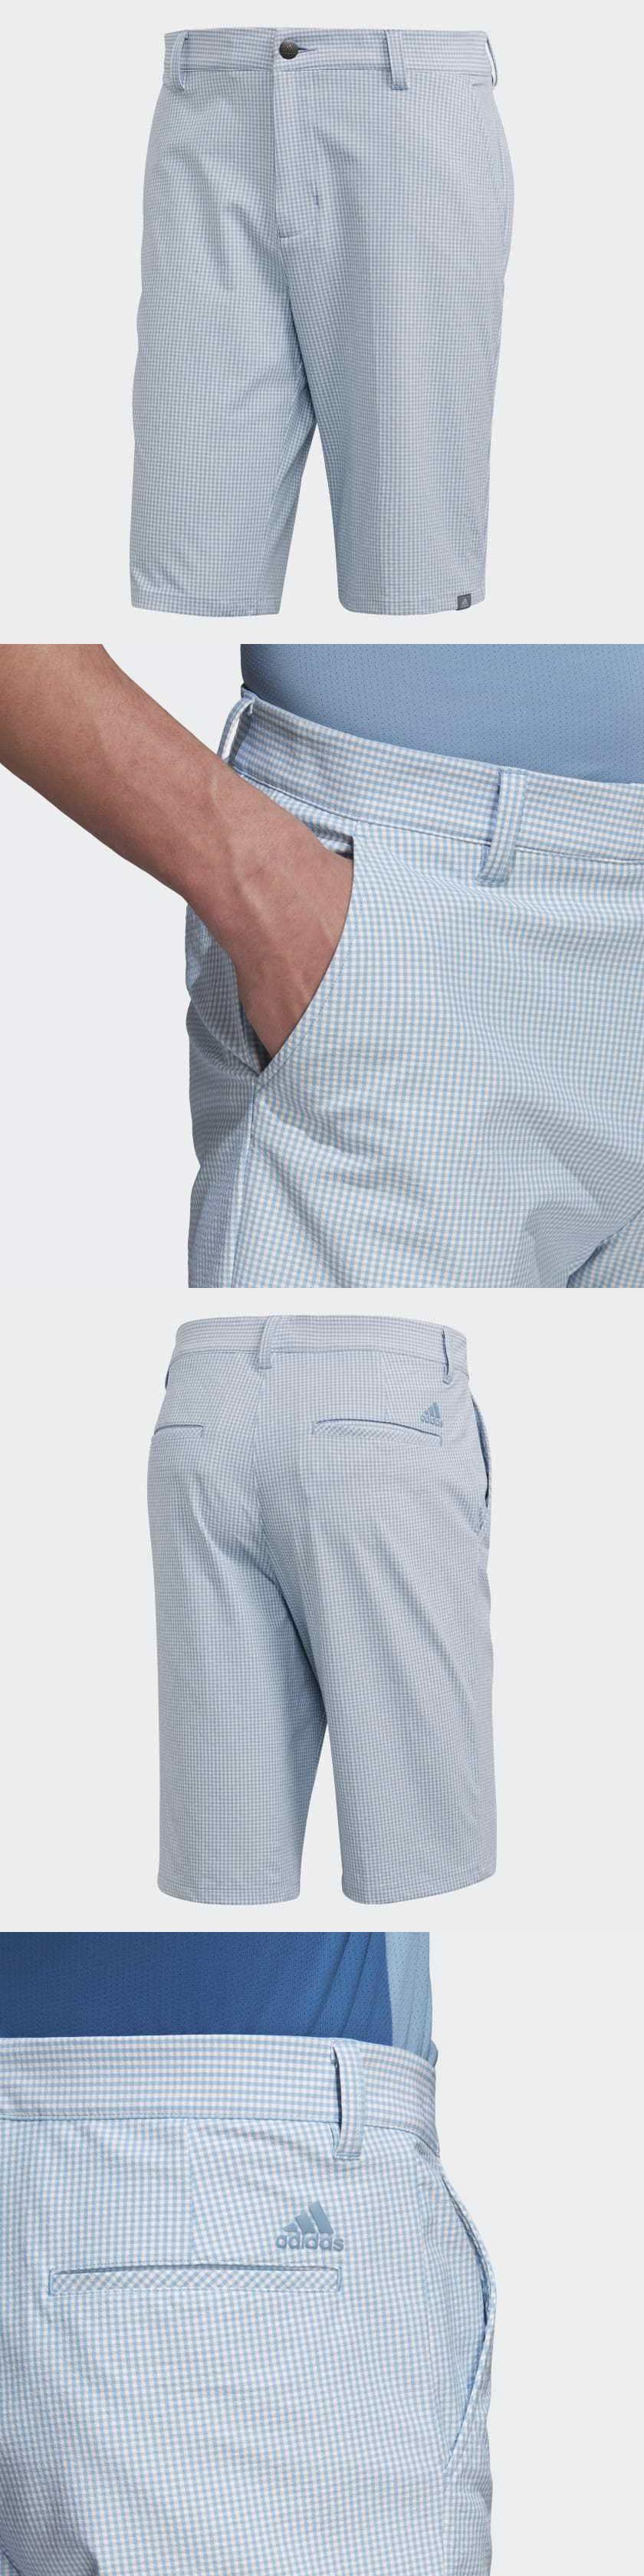 437900b53a31 Shorts 181139  Adidas Ultimate 365 Gingham Plaid Shorts (Ash Blue White) -